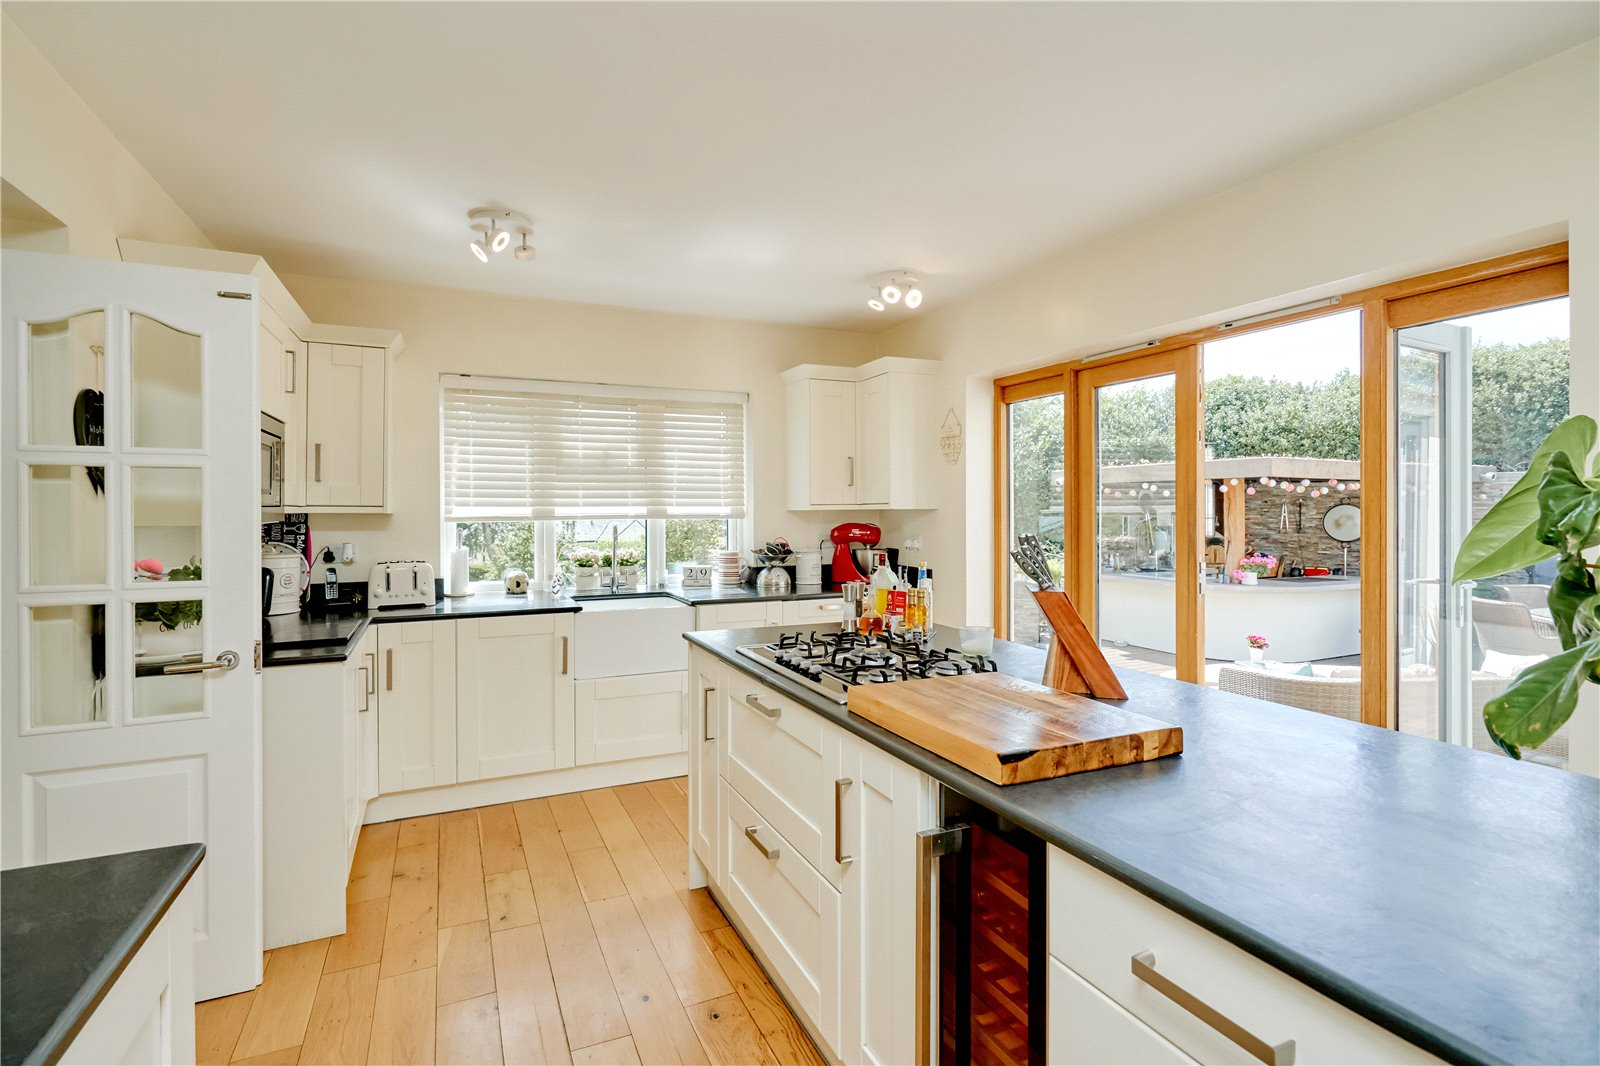 4 bed house for sale in Welwyn, AL6 0QG, AL6